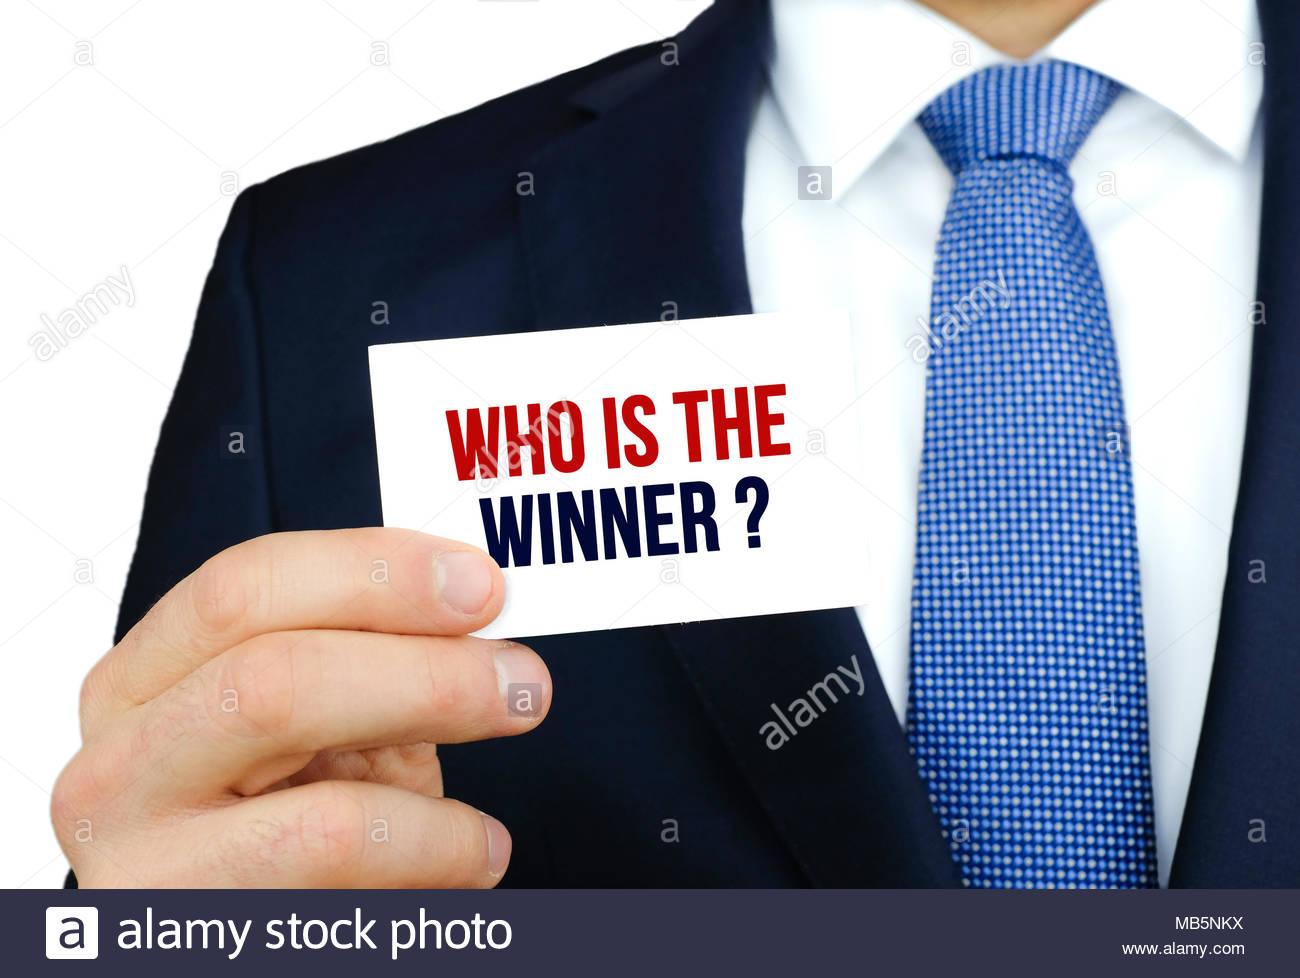 Qui est le gagnant Photo Stock